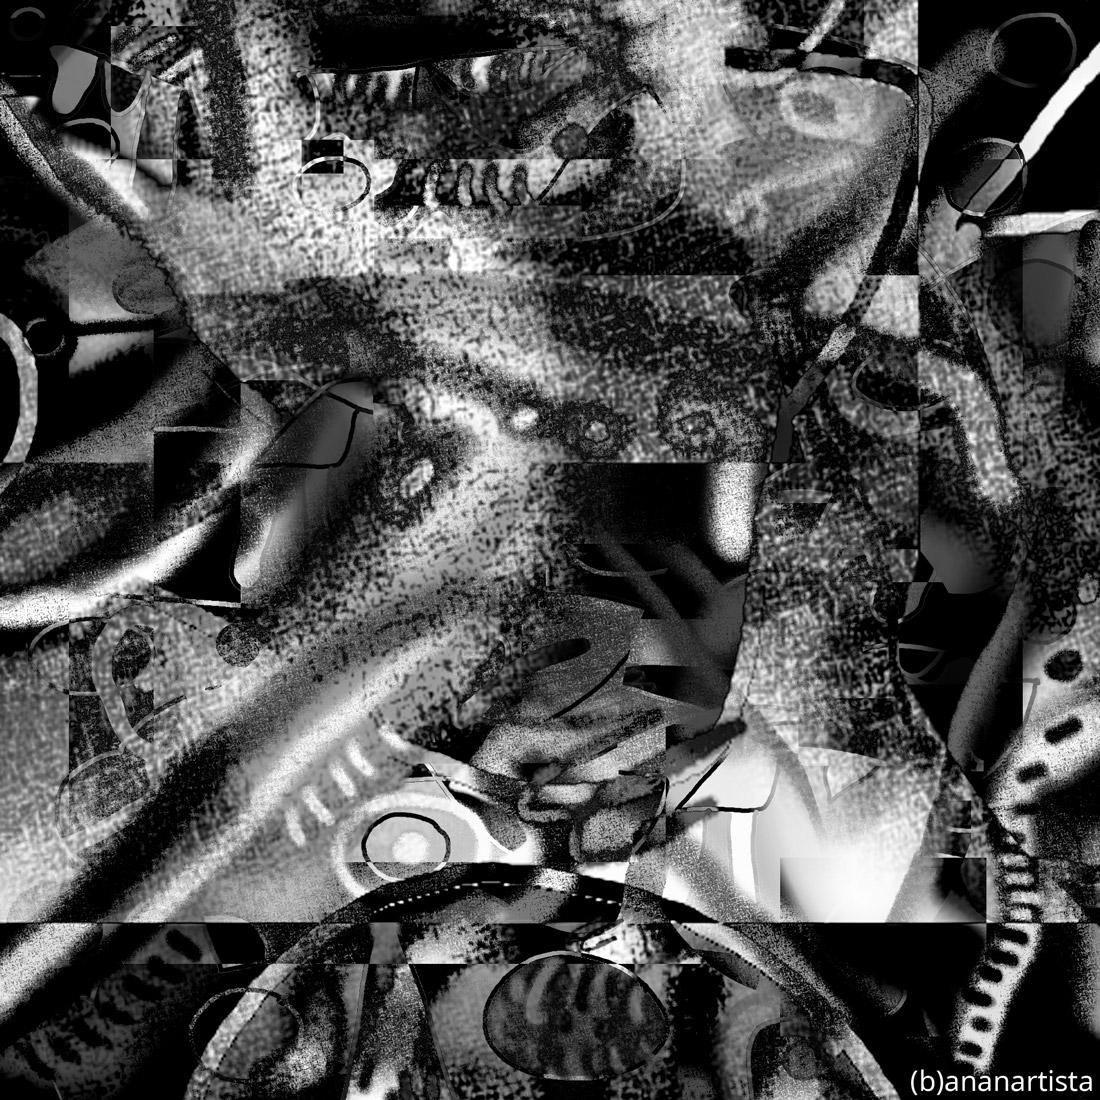 Fecondazione nera: artwork by (b)ananartista sbuff